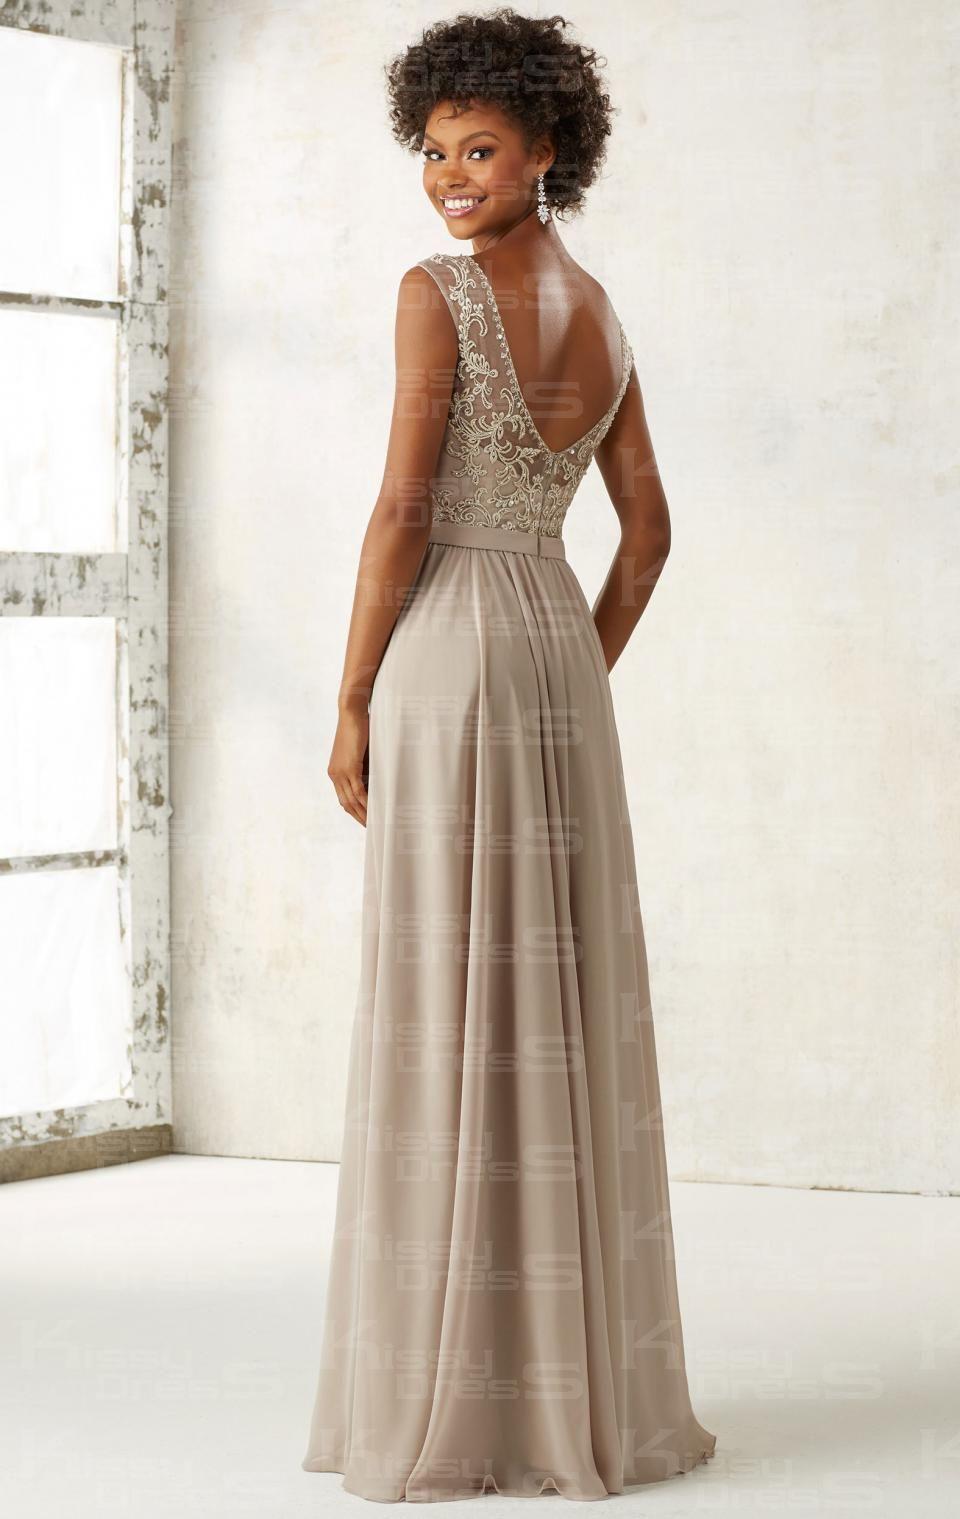 Kissybridesmaidsmodest champagne long bridesmaid dress